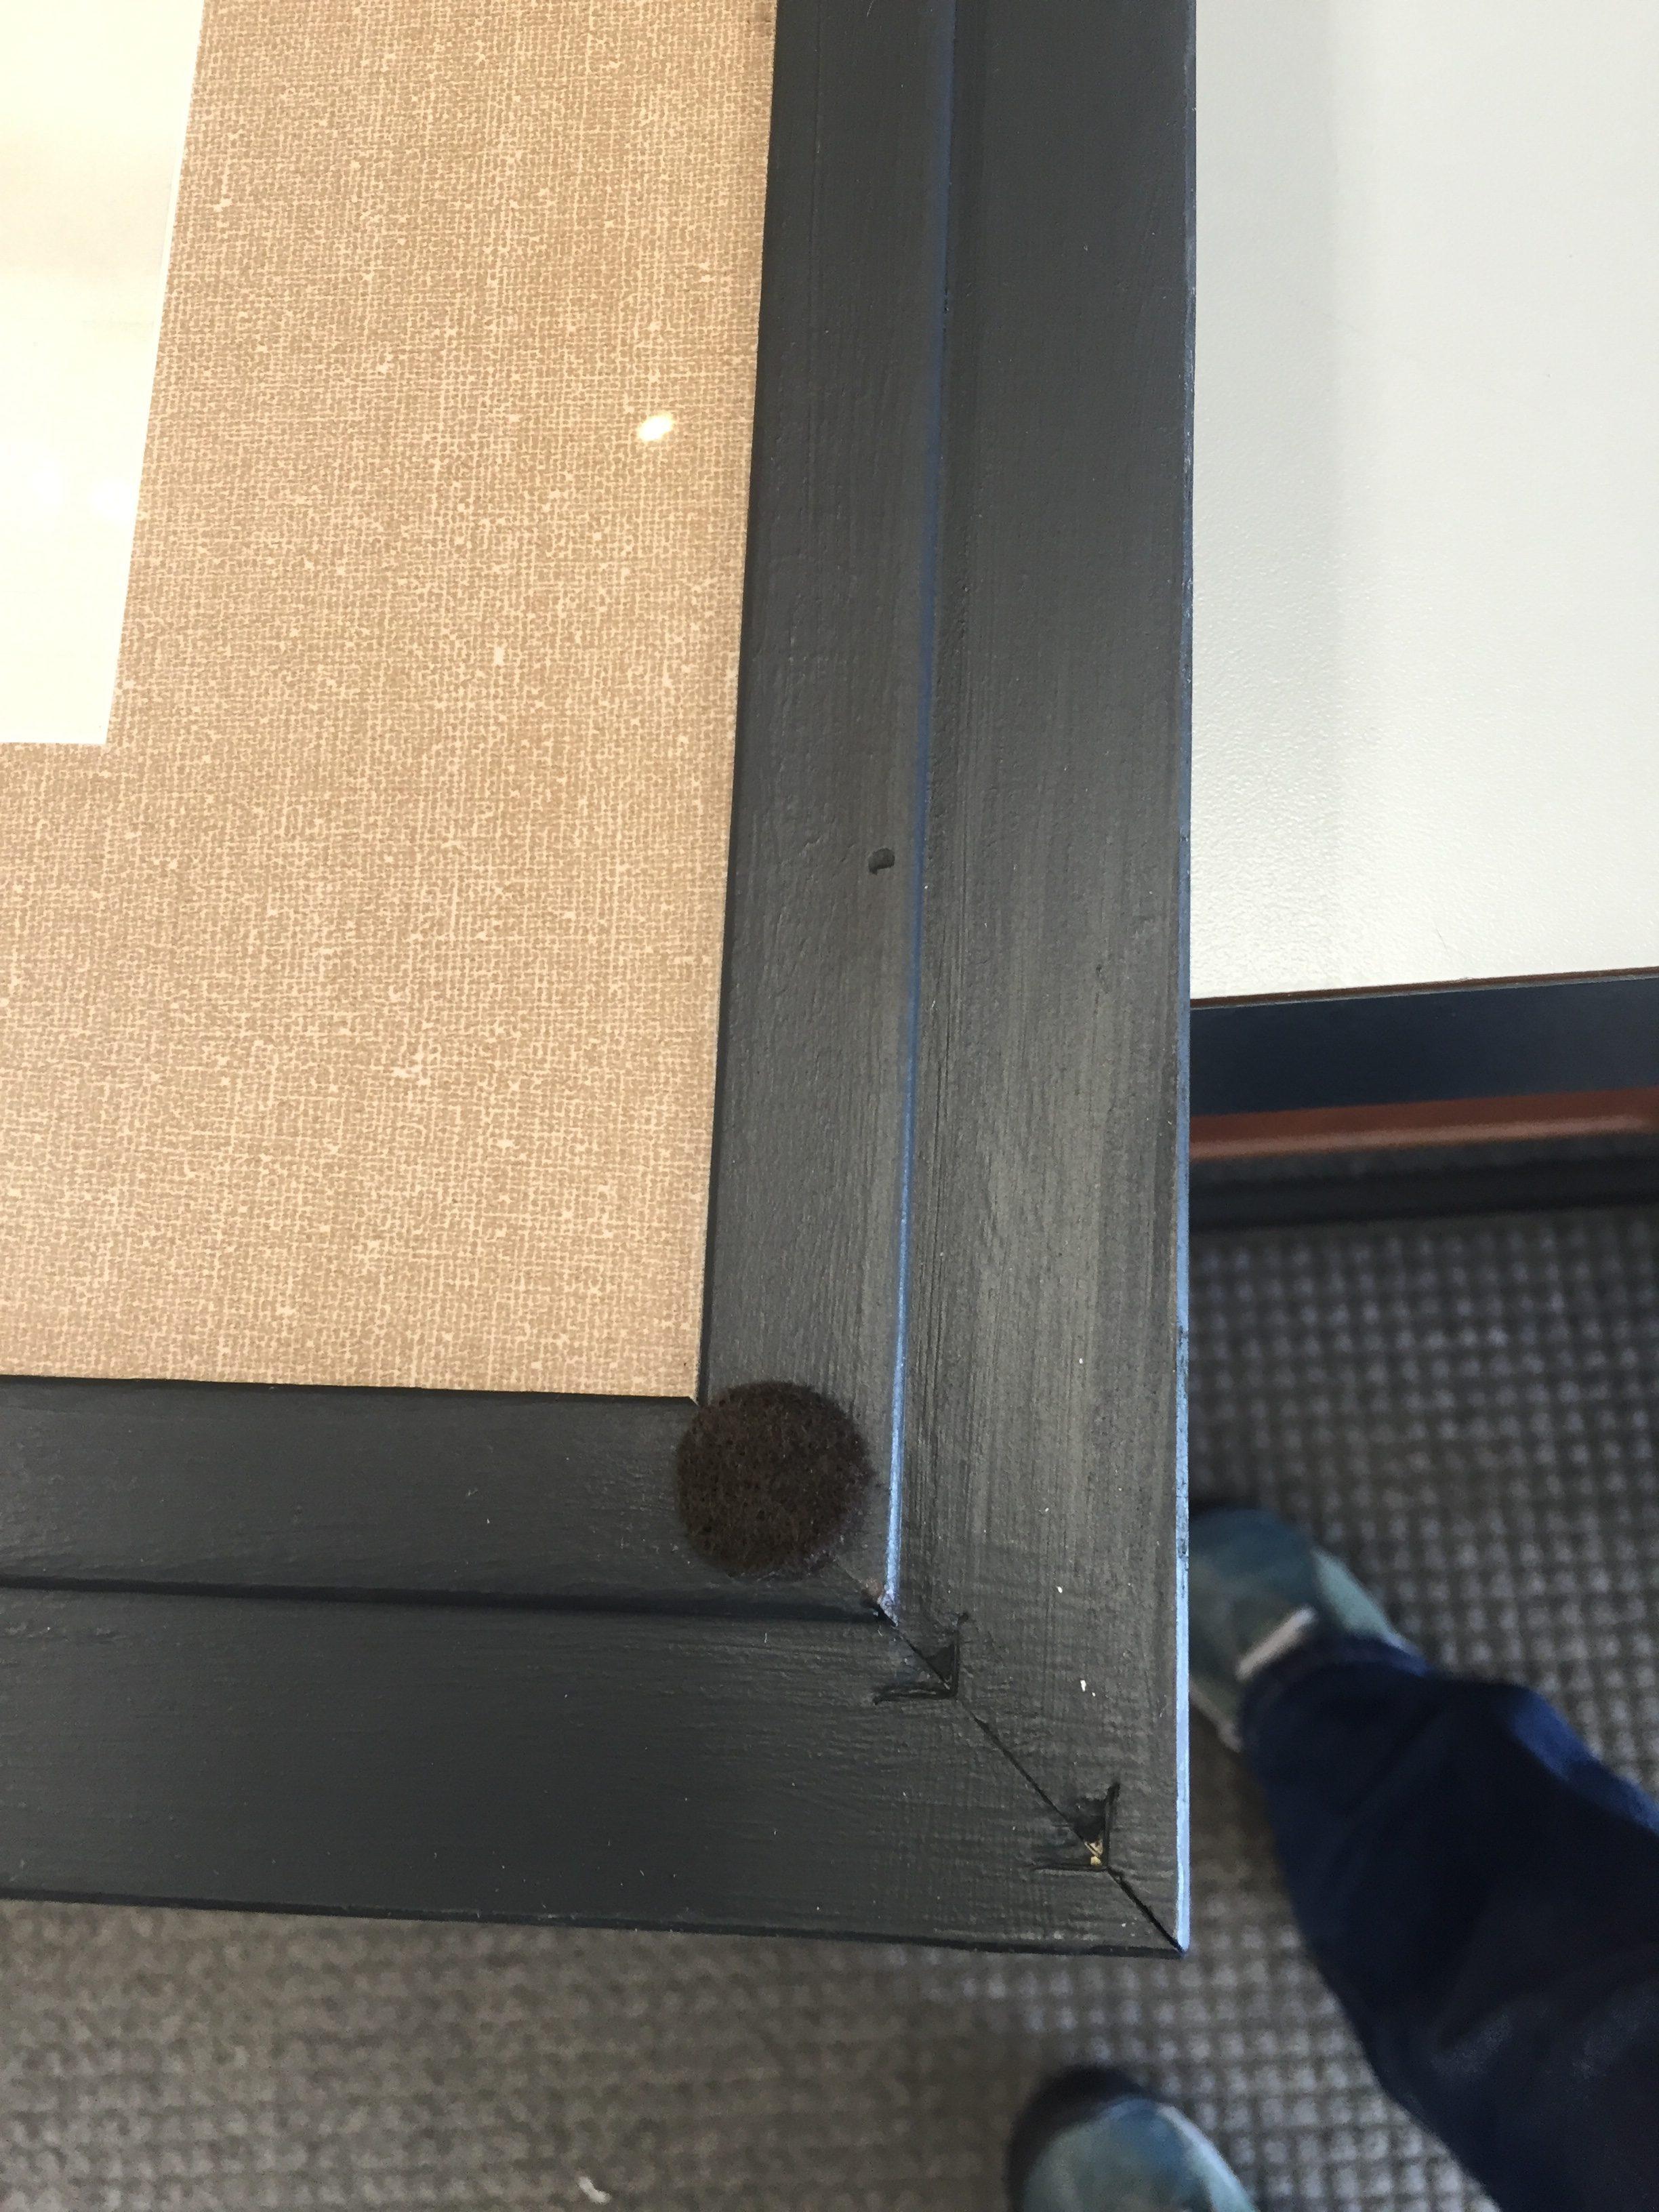 Double Sided Frame Back Side